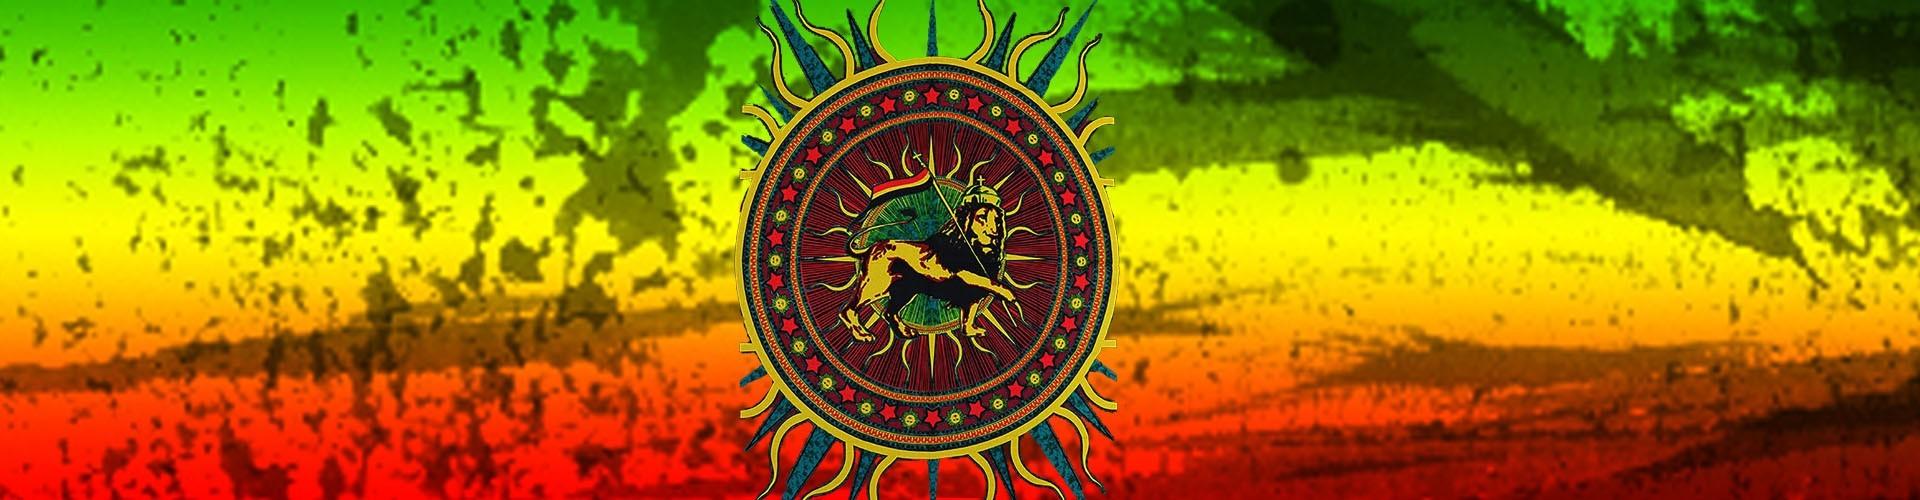 Tenture Rasta ou Bob Marley aux couleurs de la Jamaïque tenture rasta